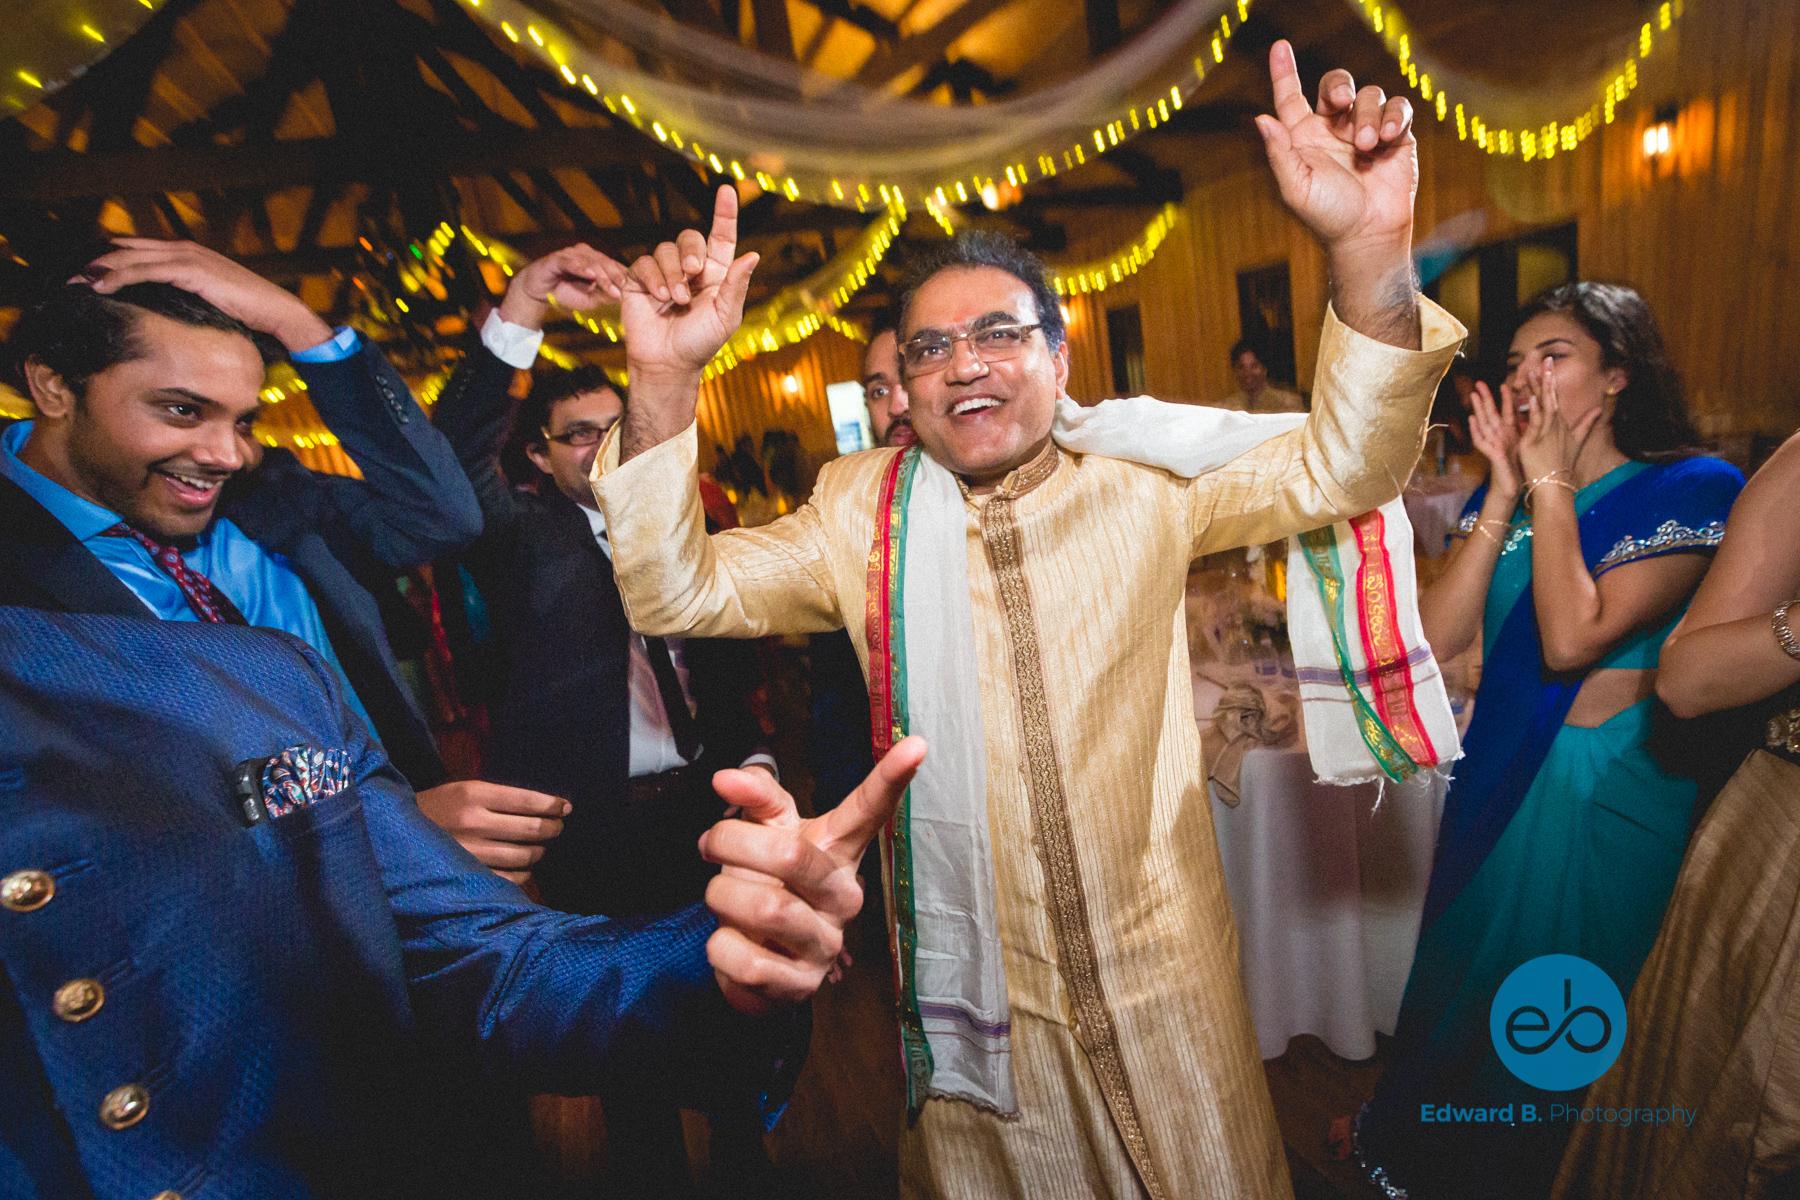 indian-wedding-engagement-reception-san-antonio-austin-texas-25.jpg